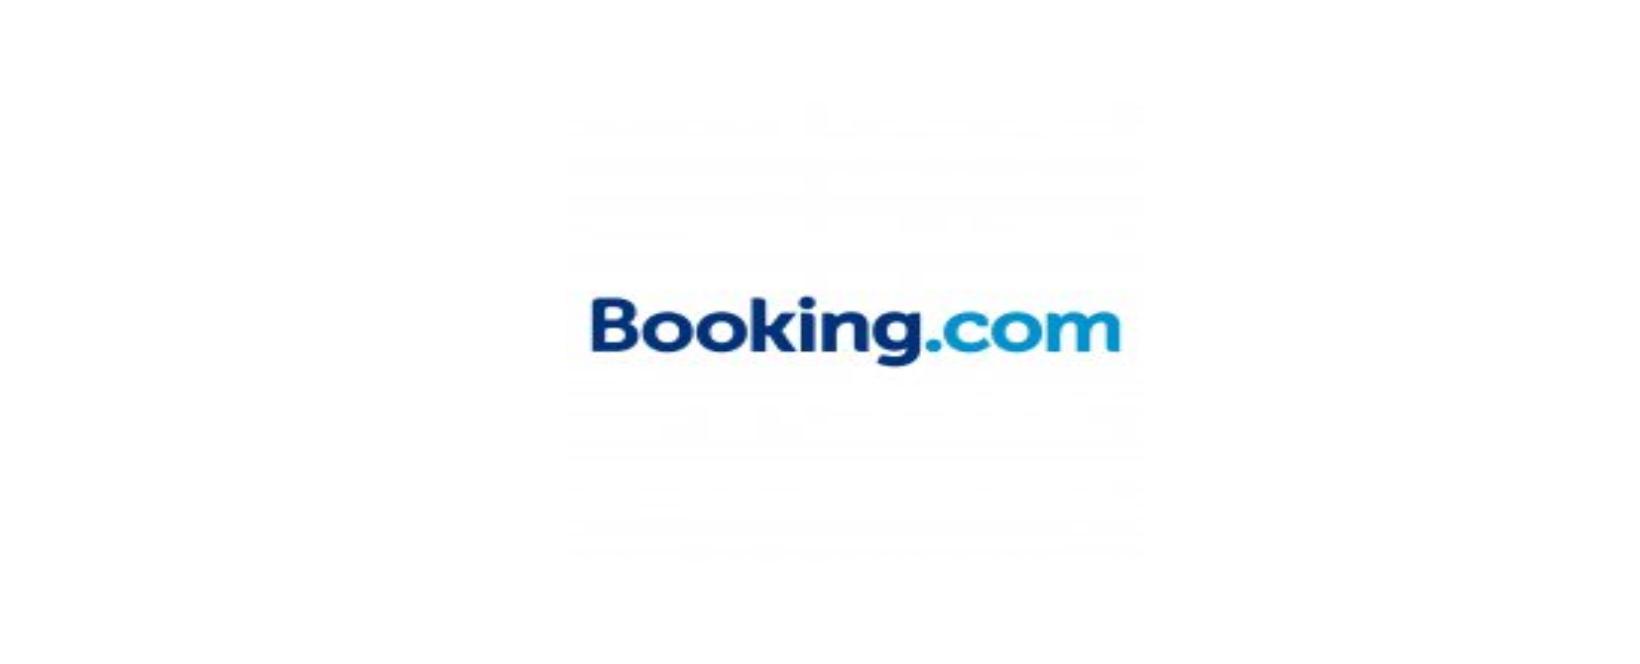 booking.com Discount Code 2021